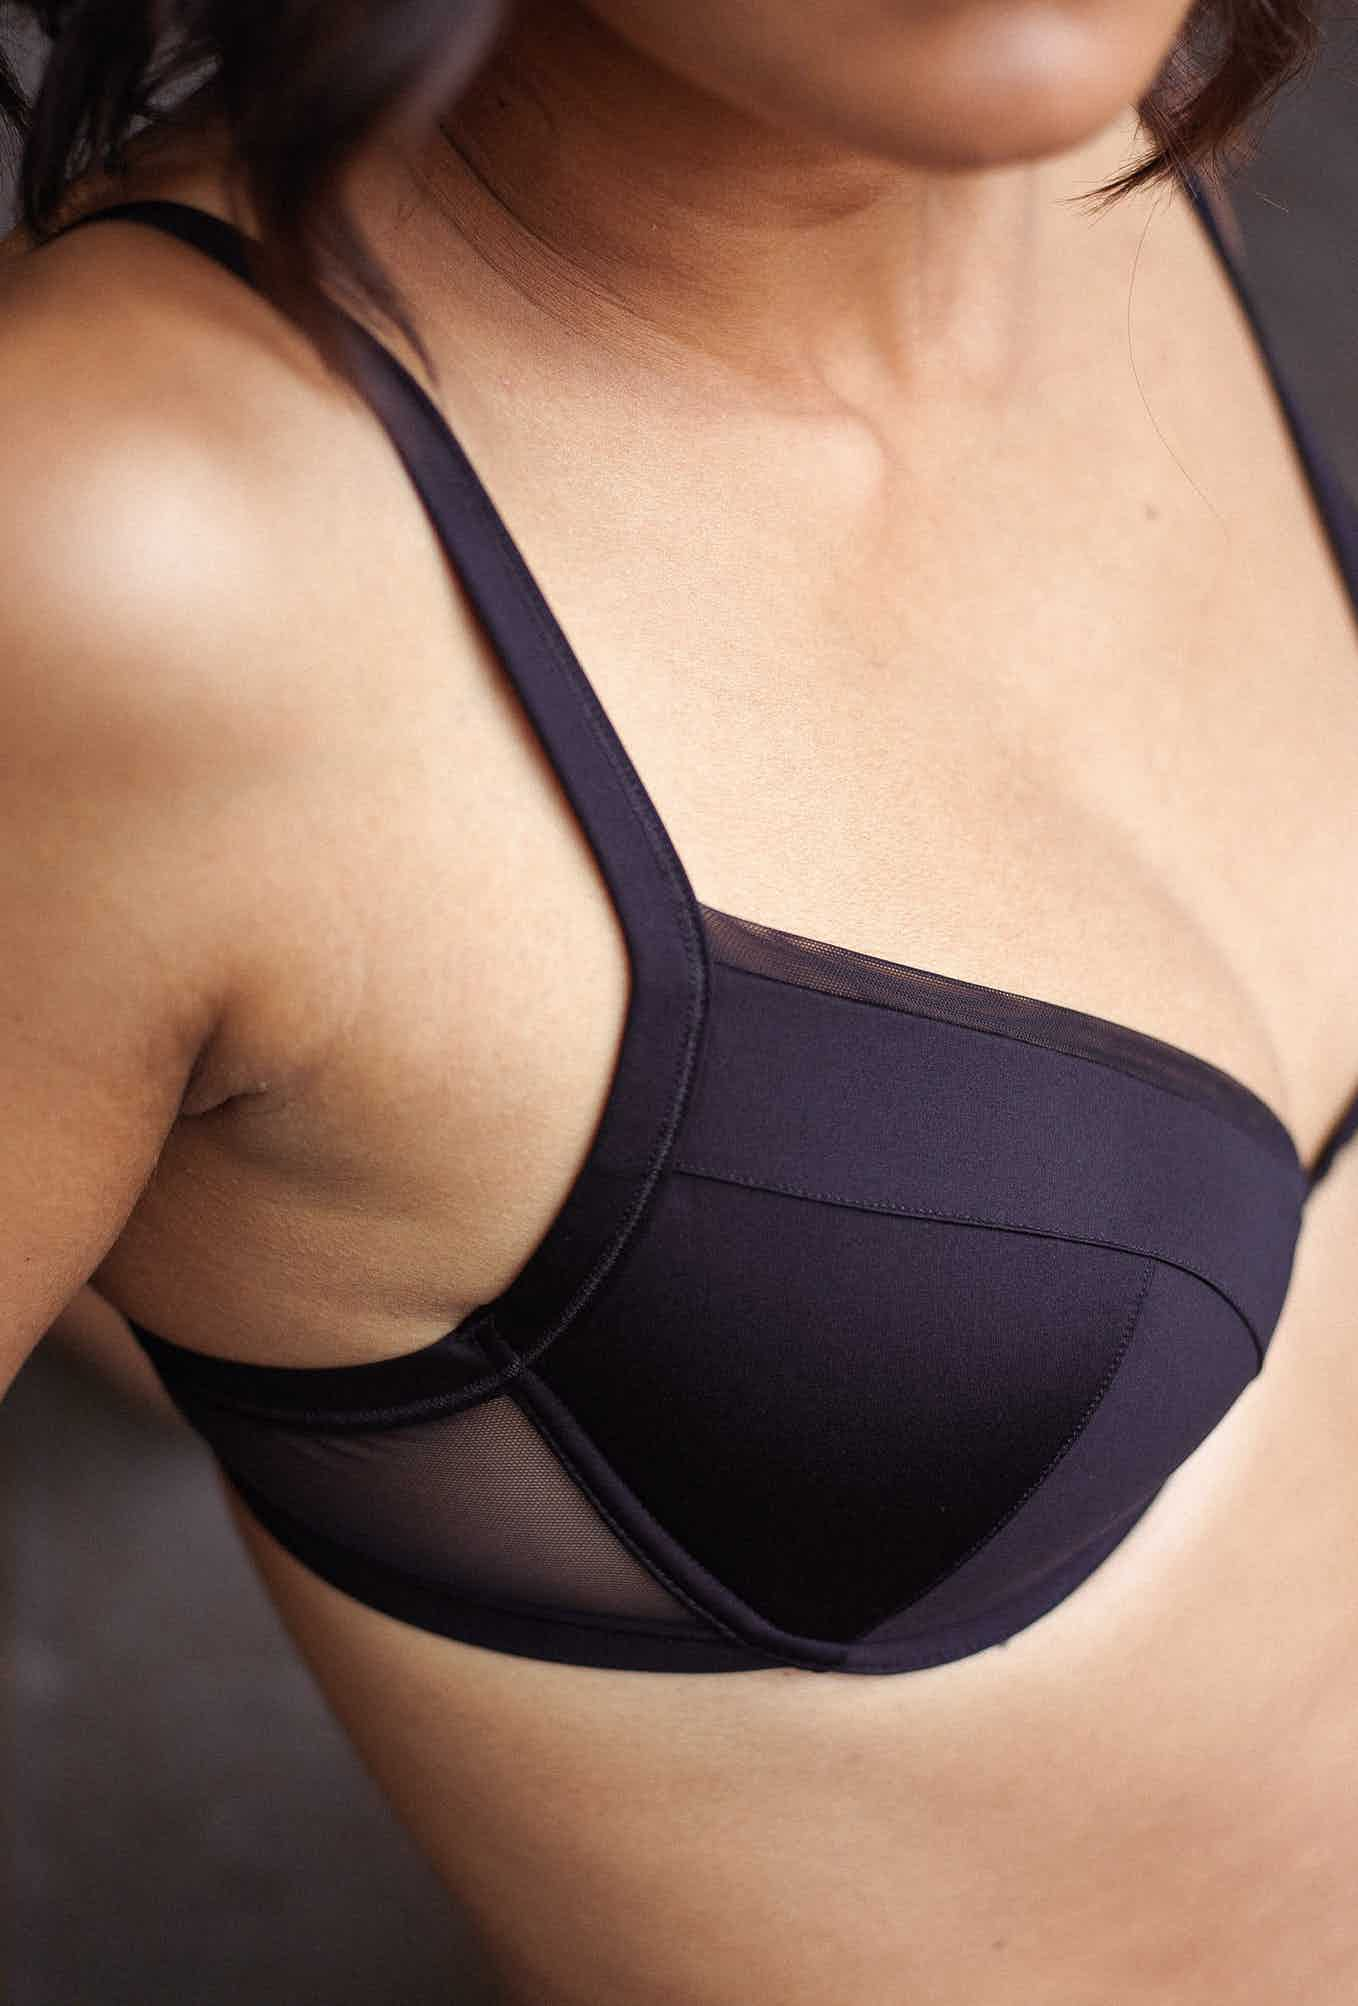 Push-up bra Histoire de femmes in black